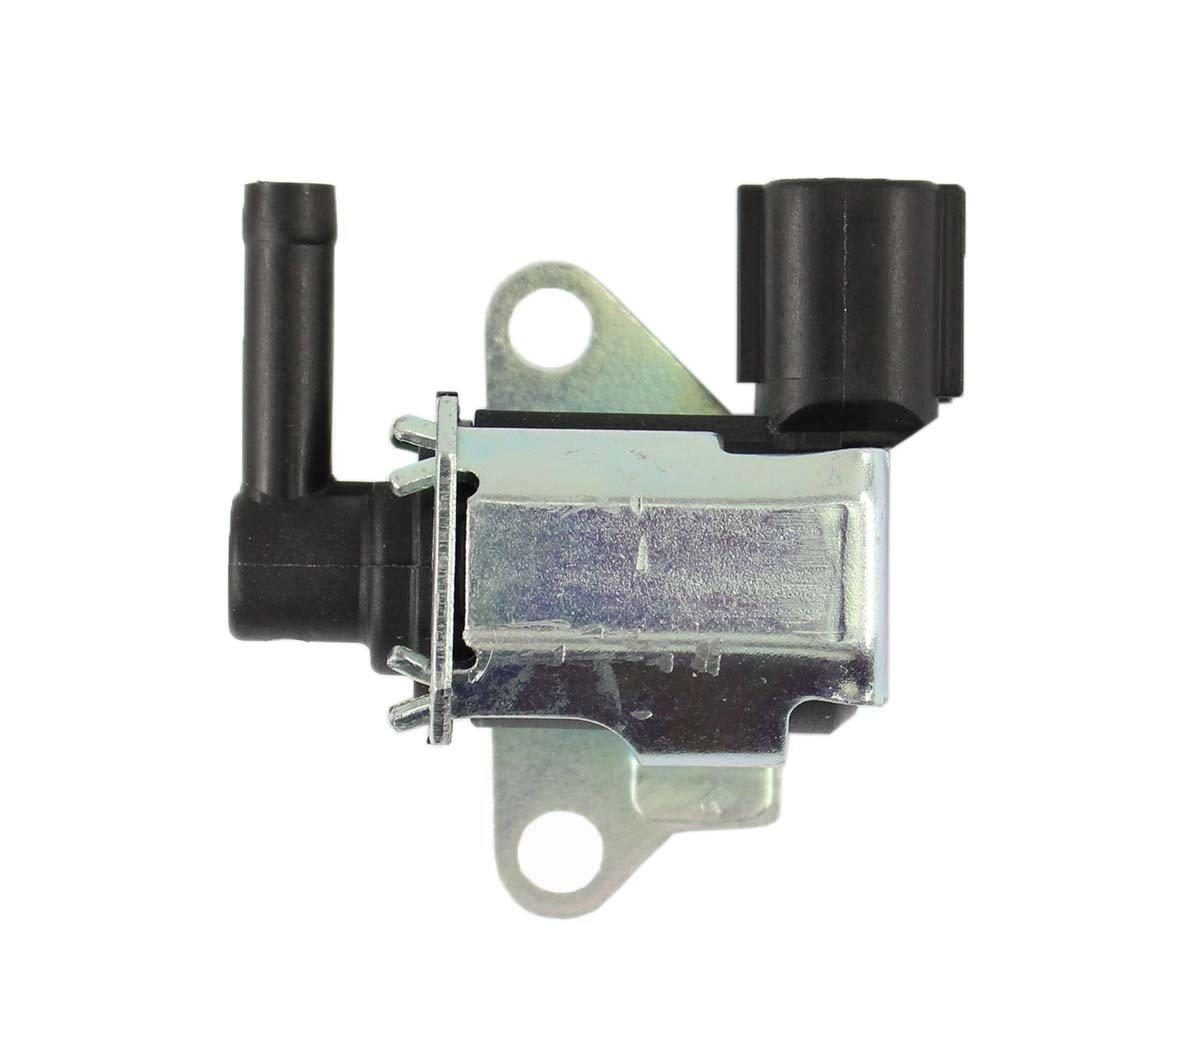 XtremeAmazing Vapor Canister Purge Control Solenoid Valve K5T46680 For Honda Civic CR-V CRV